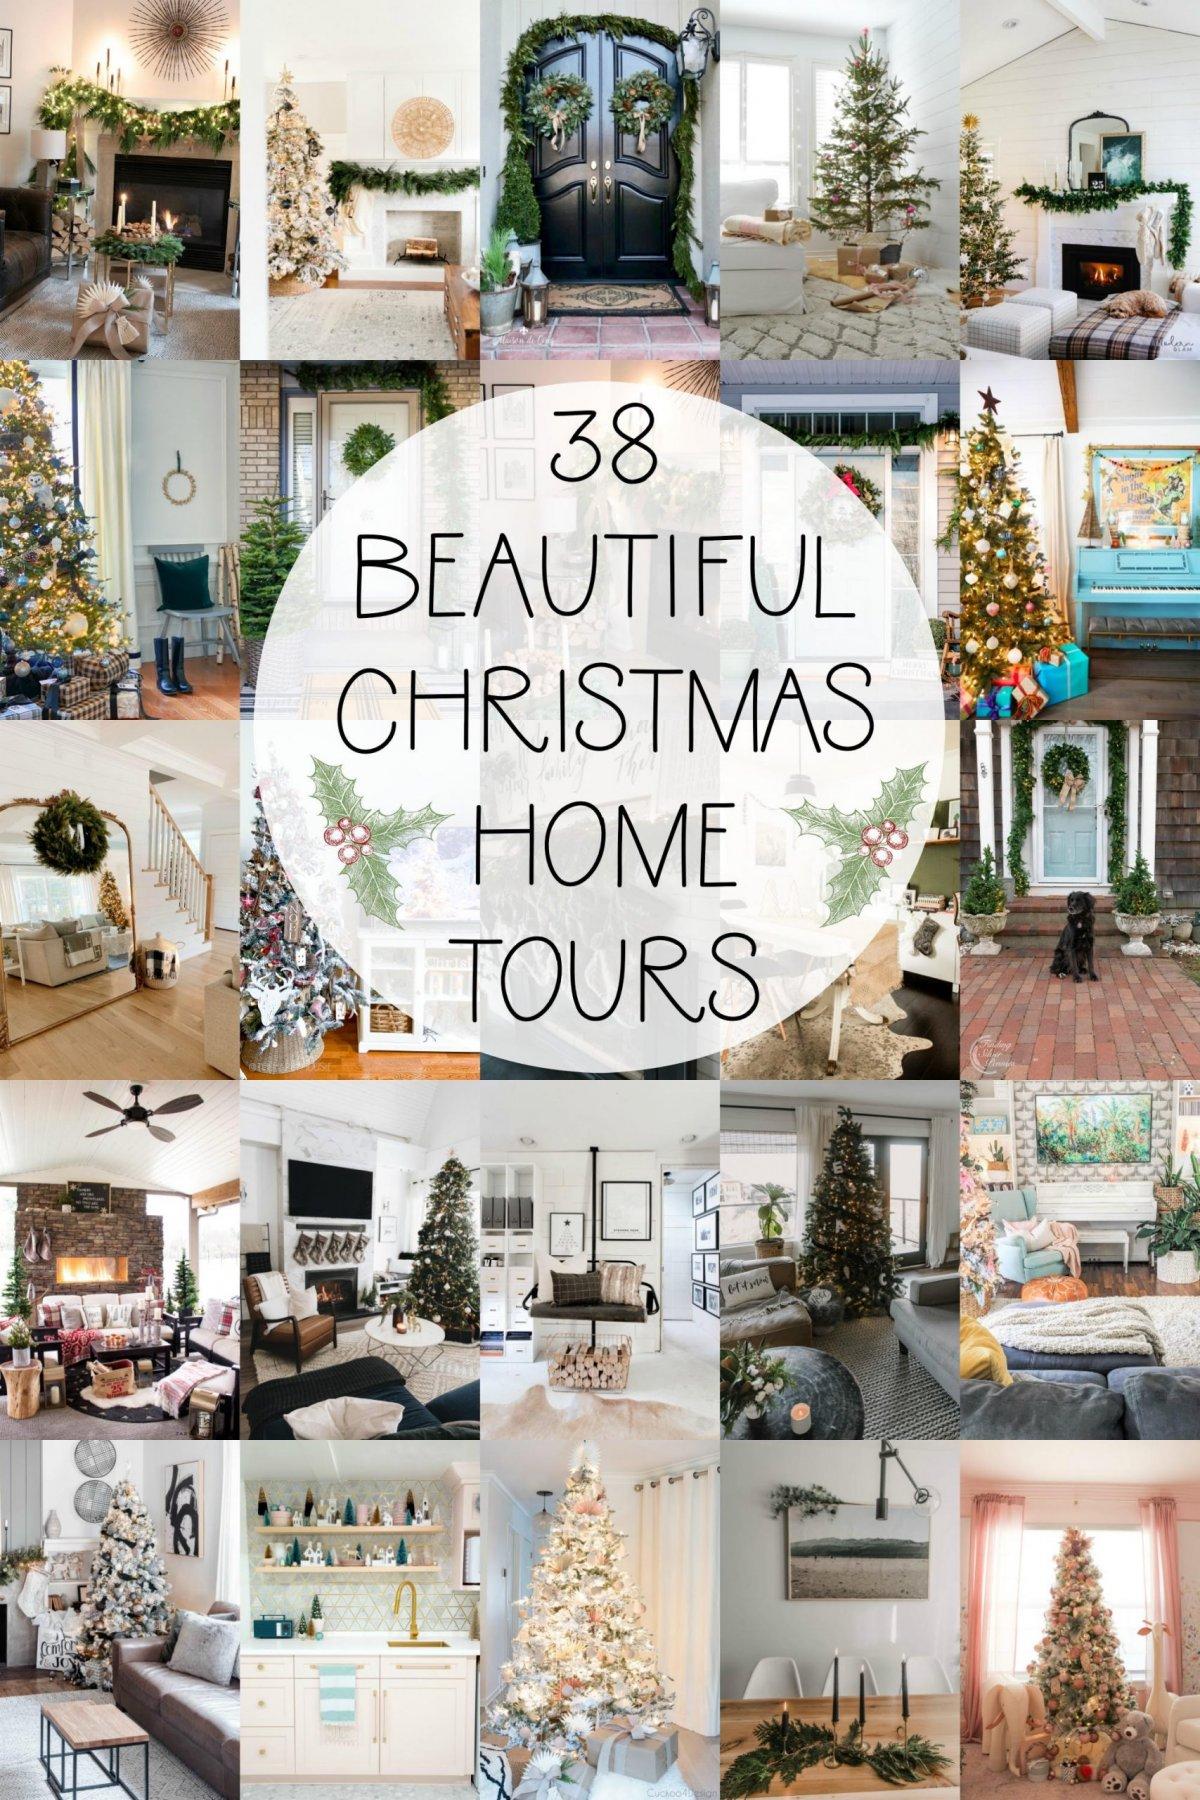 38 beautiful christmas home tours!